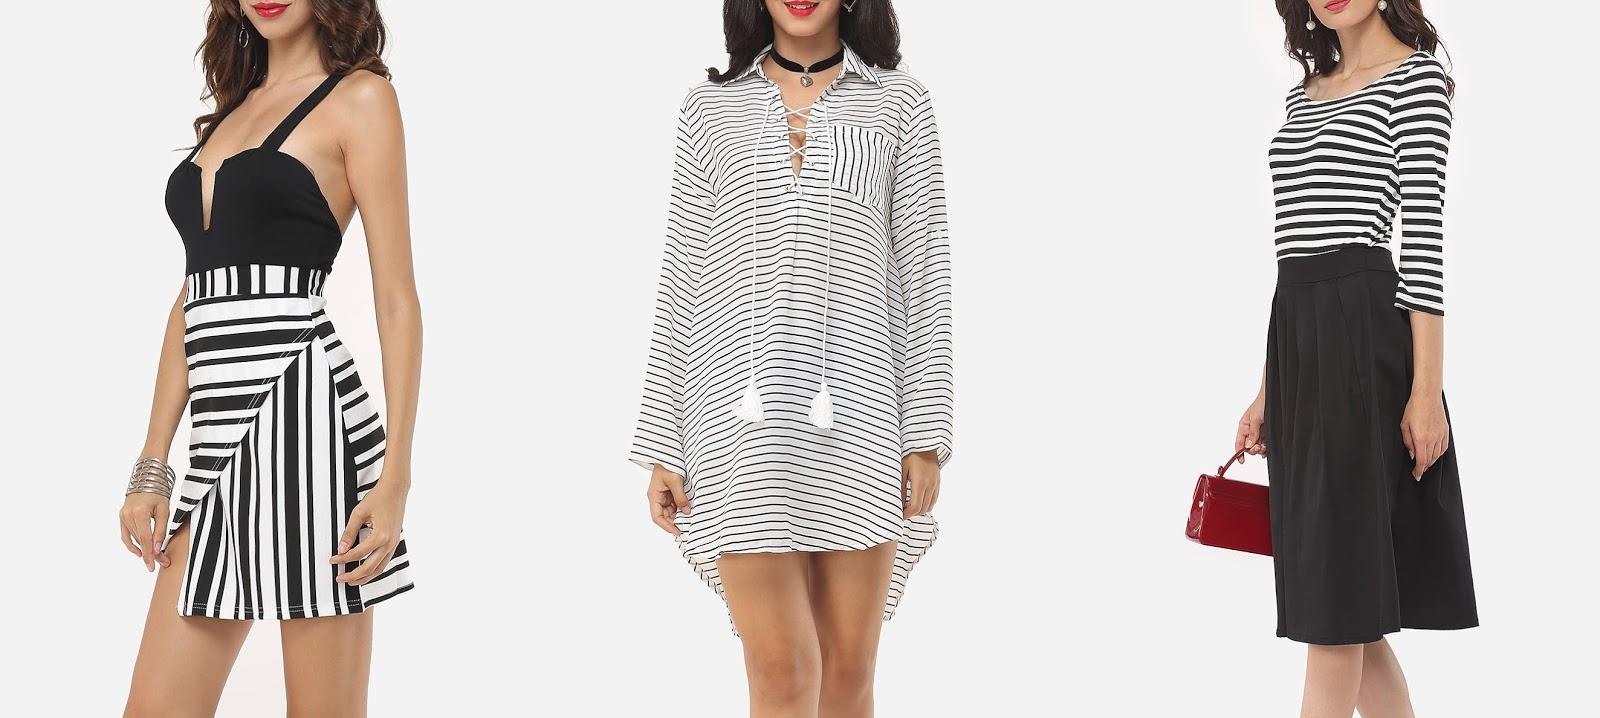 fashion blogger wishlist  Fashionmia liz breygel dresses women woman buy online store fashion outfits